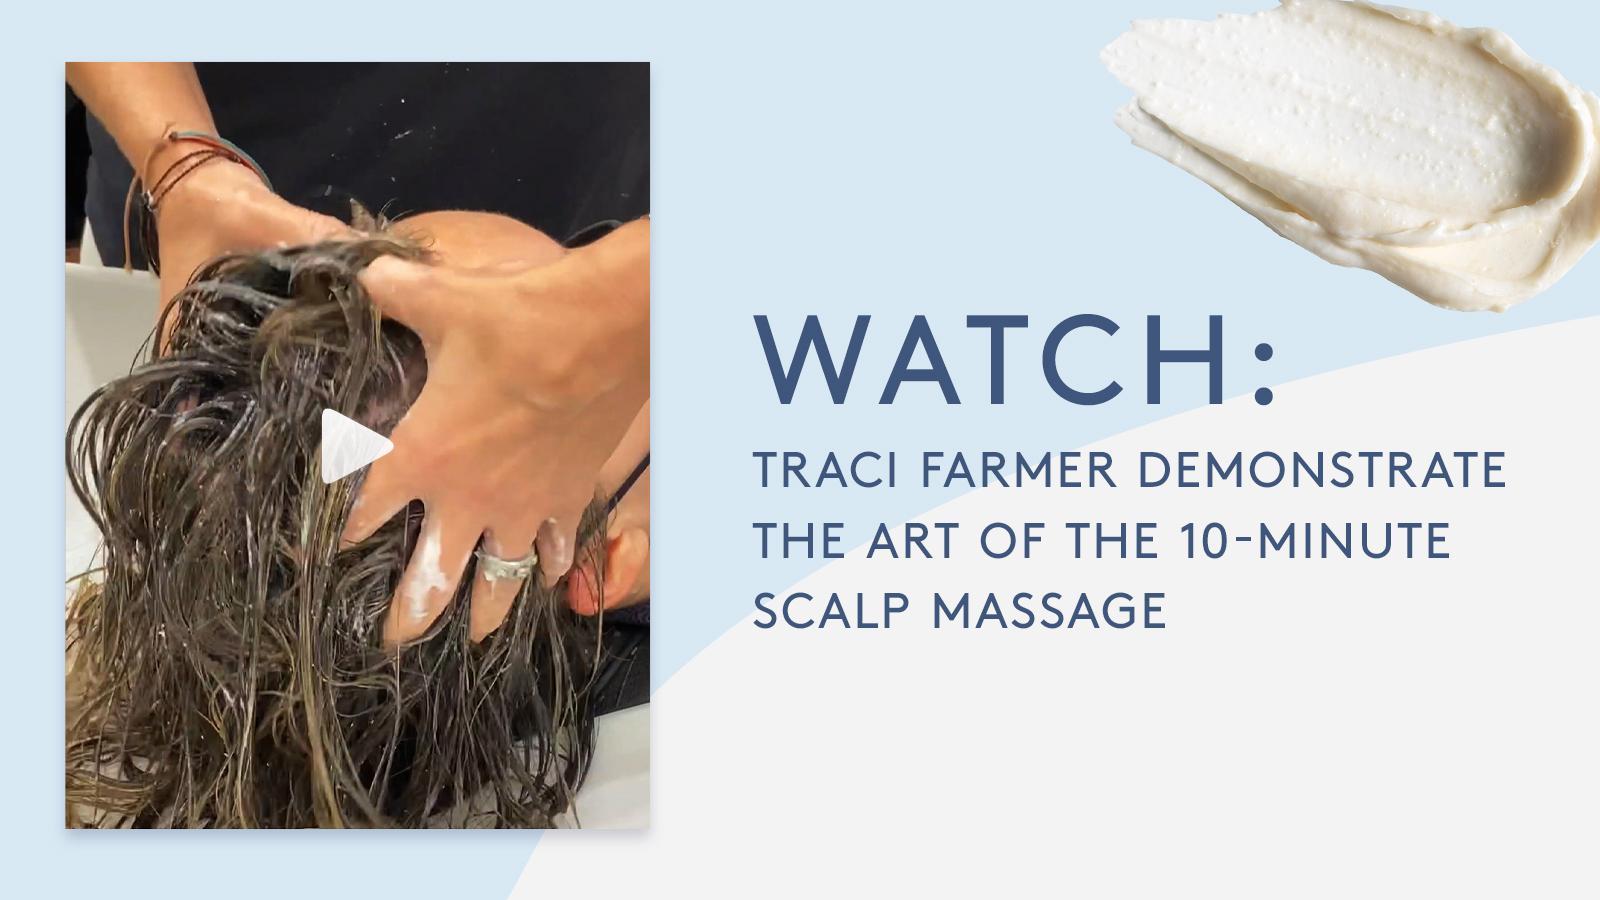 The 10-Minute Scalp Massage